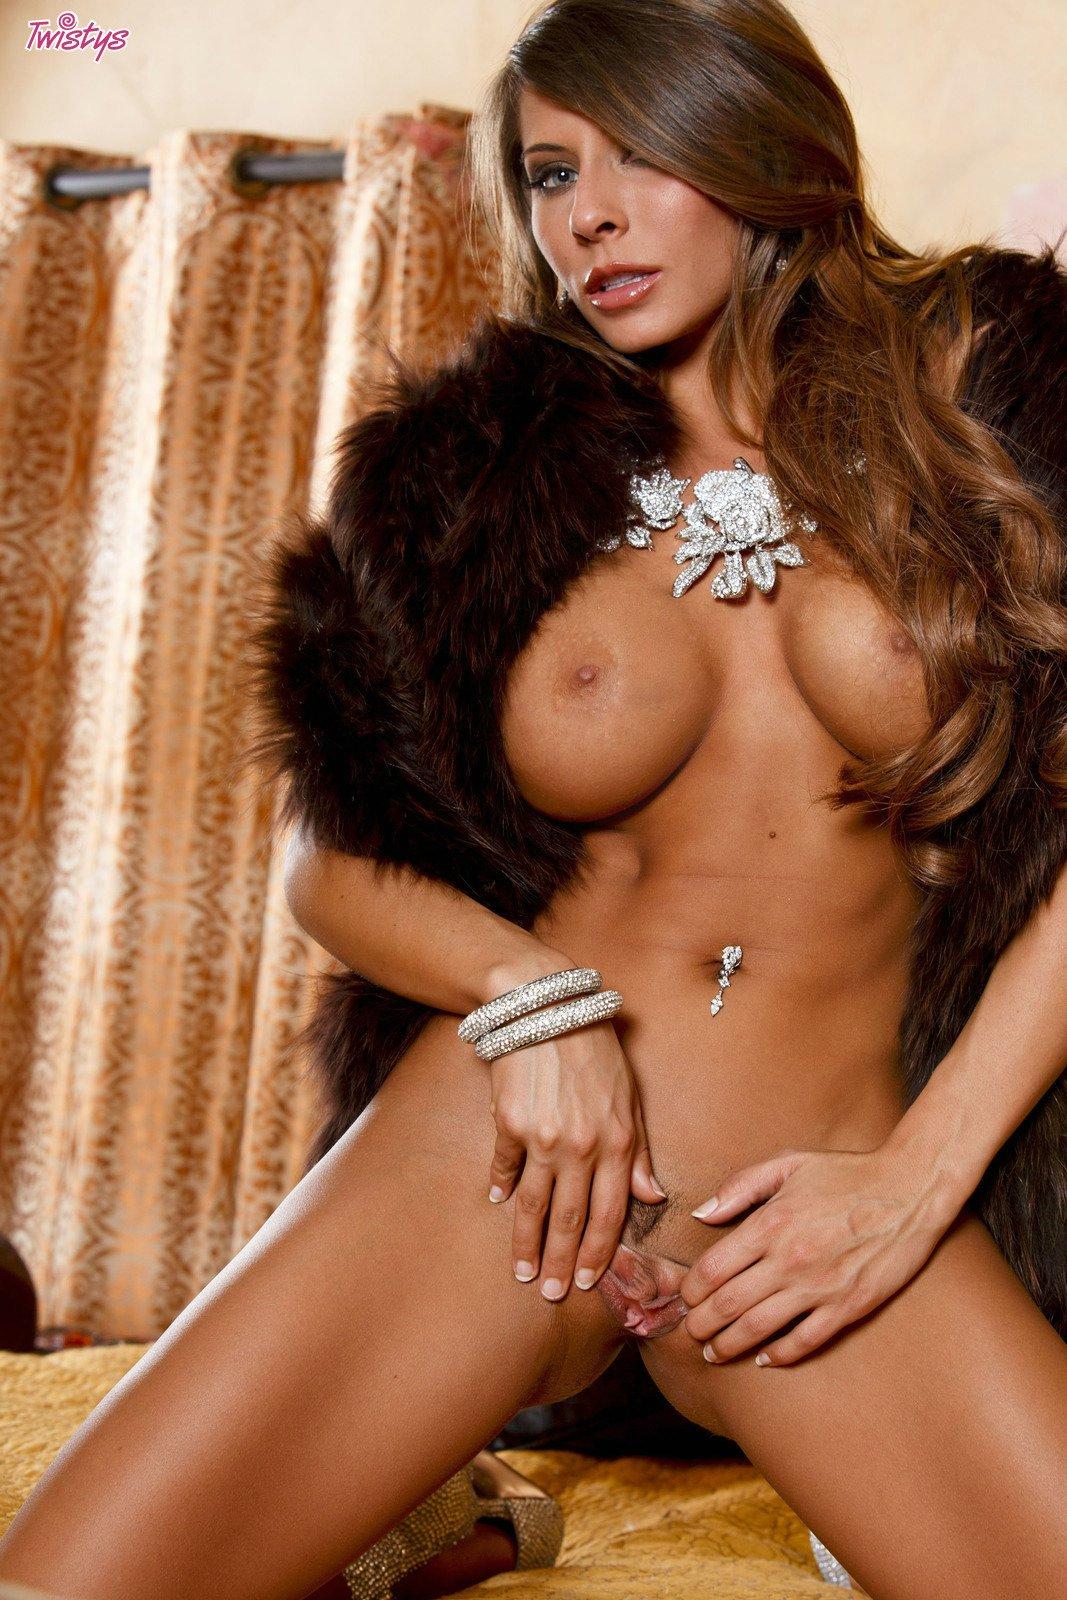 Madison Ivy Pornos